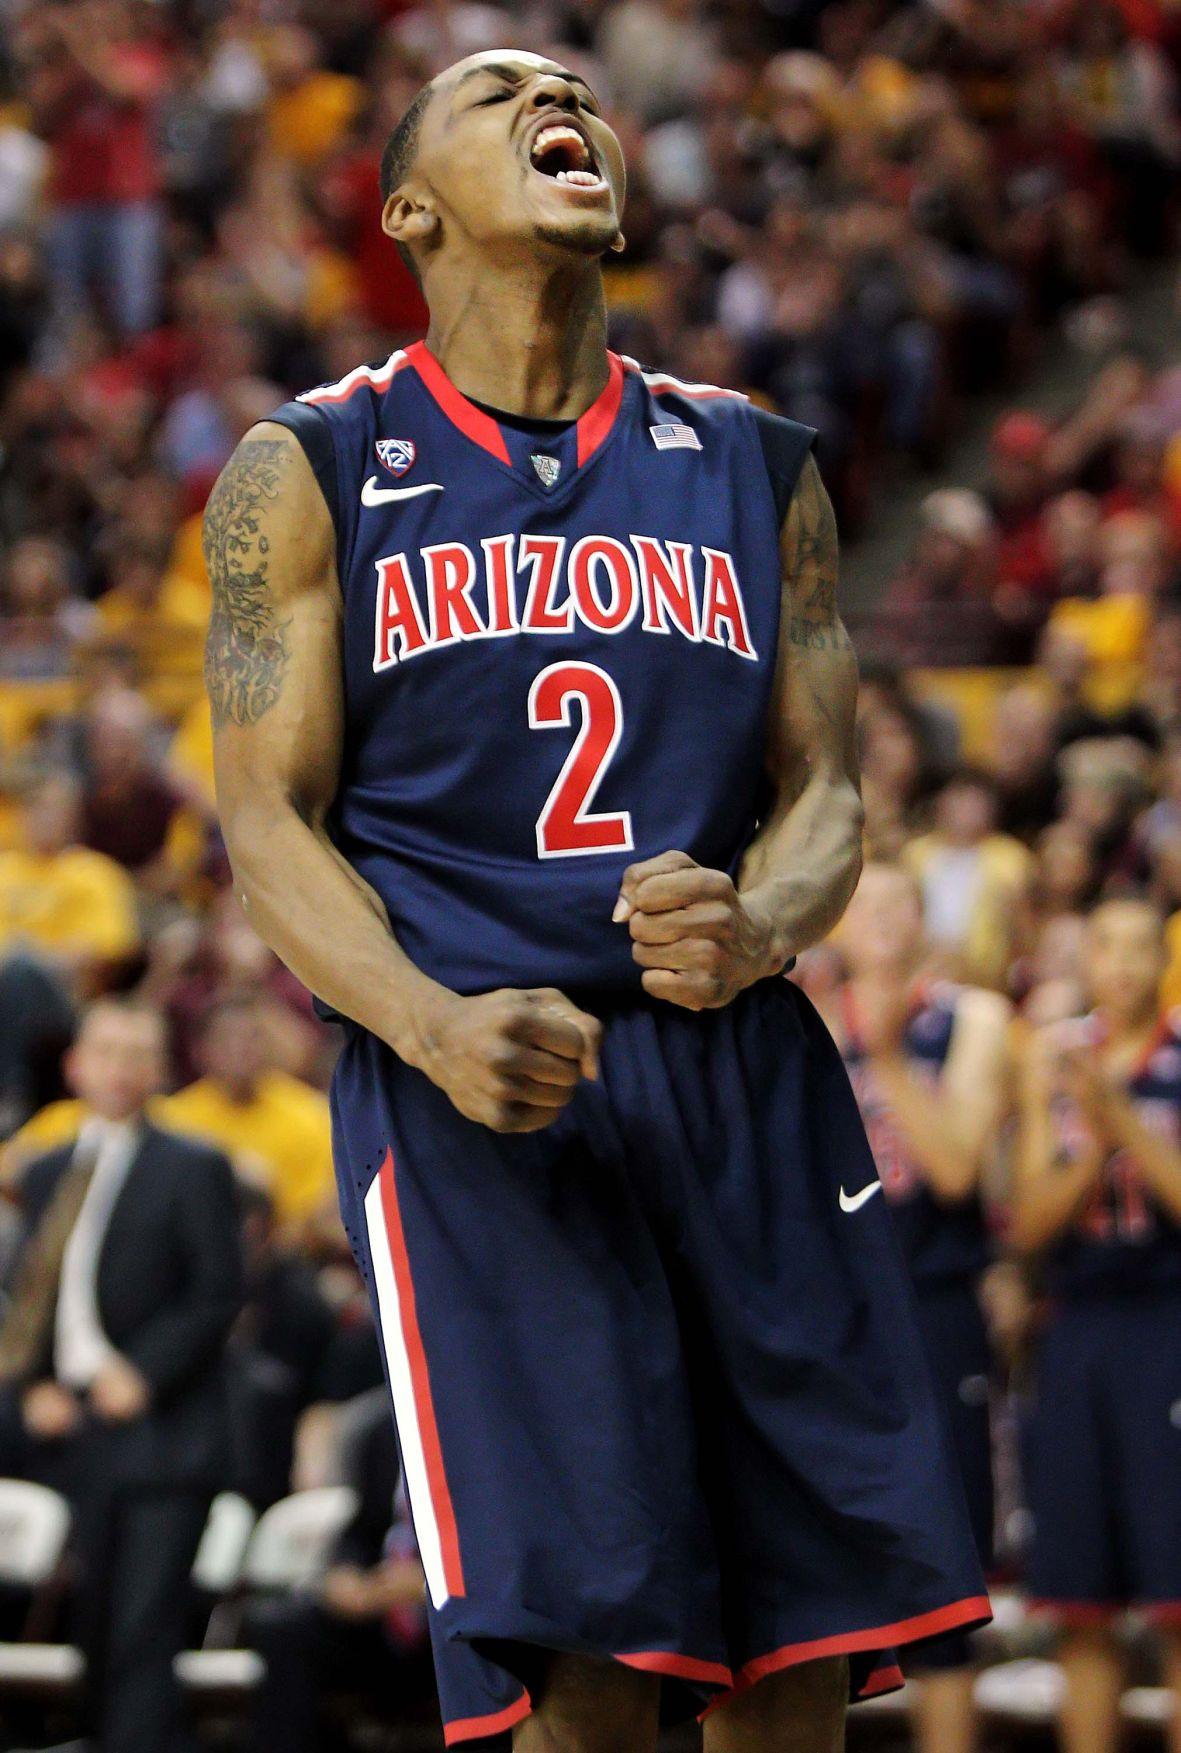 Arizona Wildcats & Santa Rita grad Stoglin ex-Cat Lyons lighting it up overseas ...